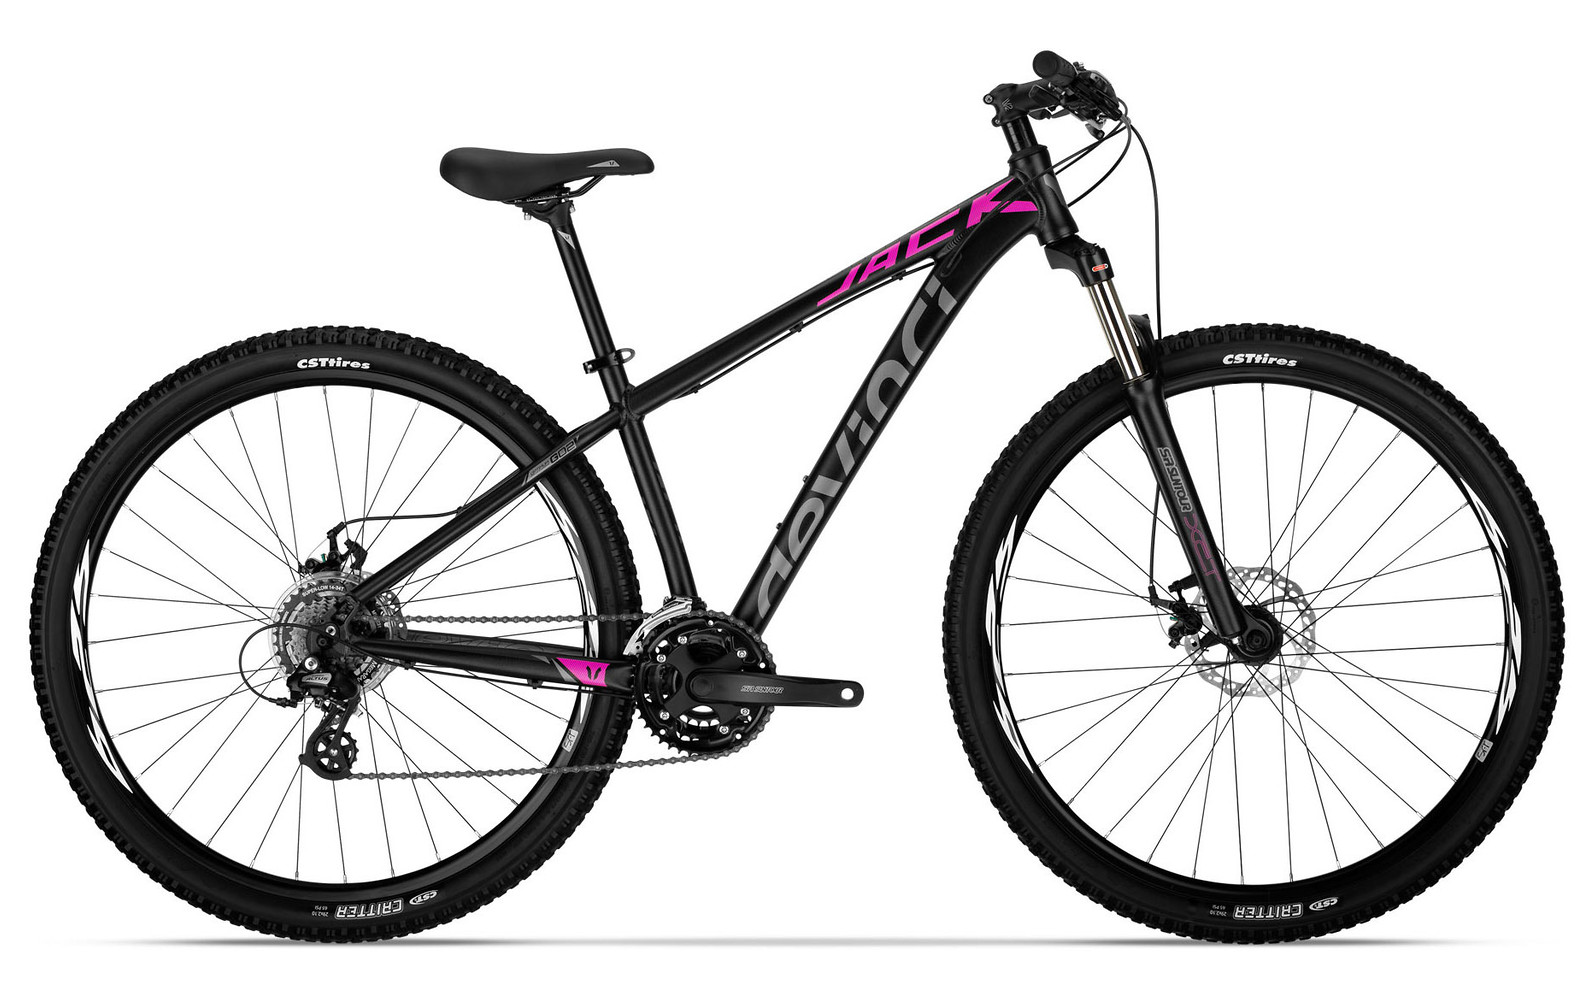 Bike - 2014 Devinci Jack S WF